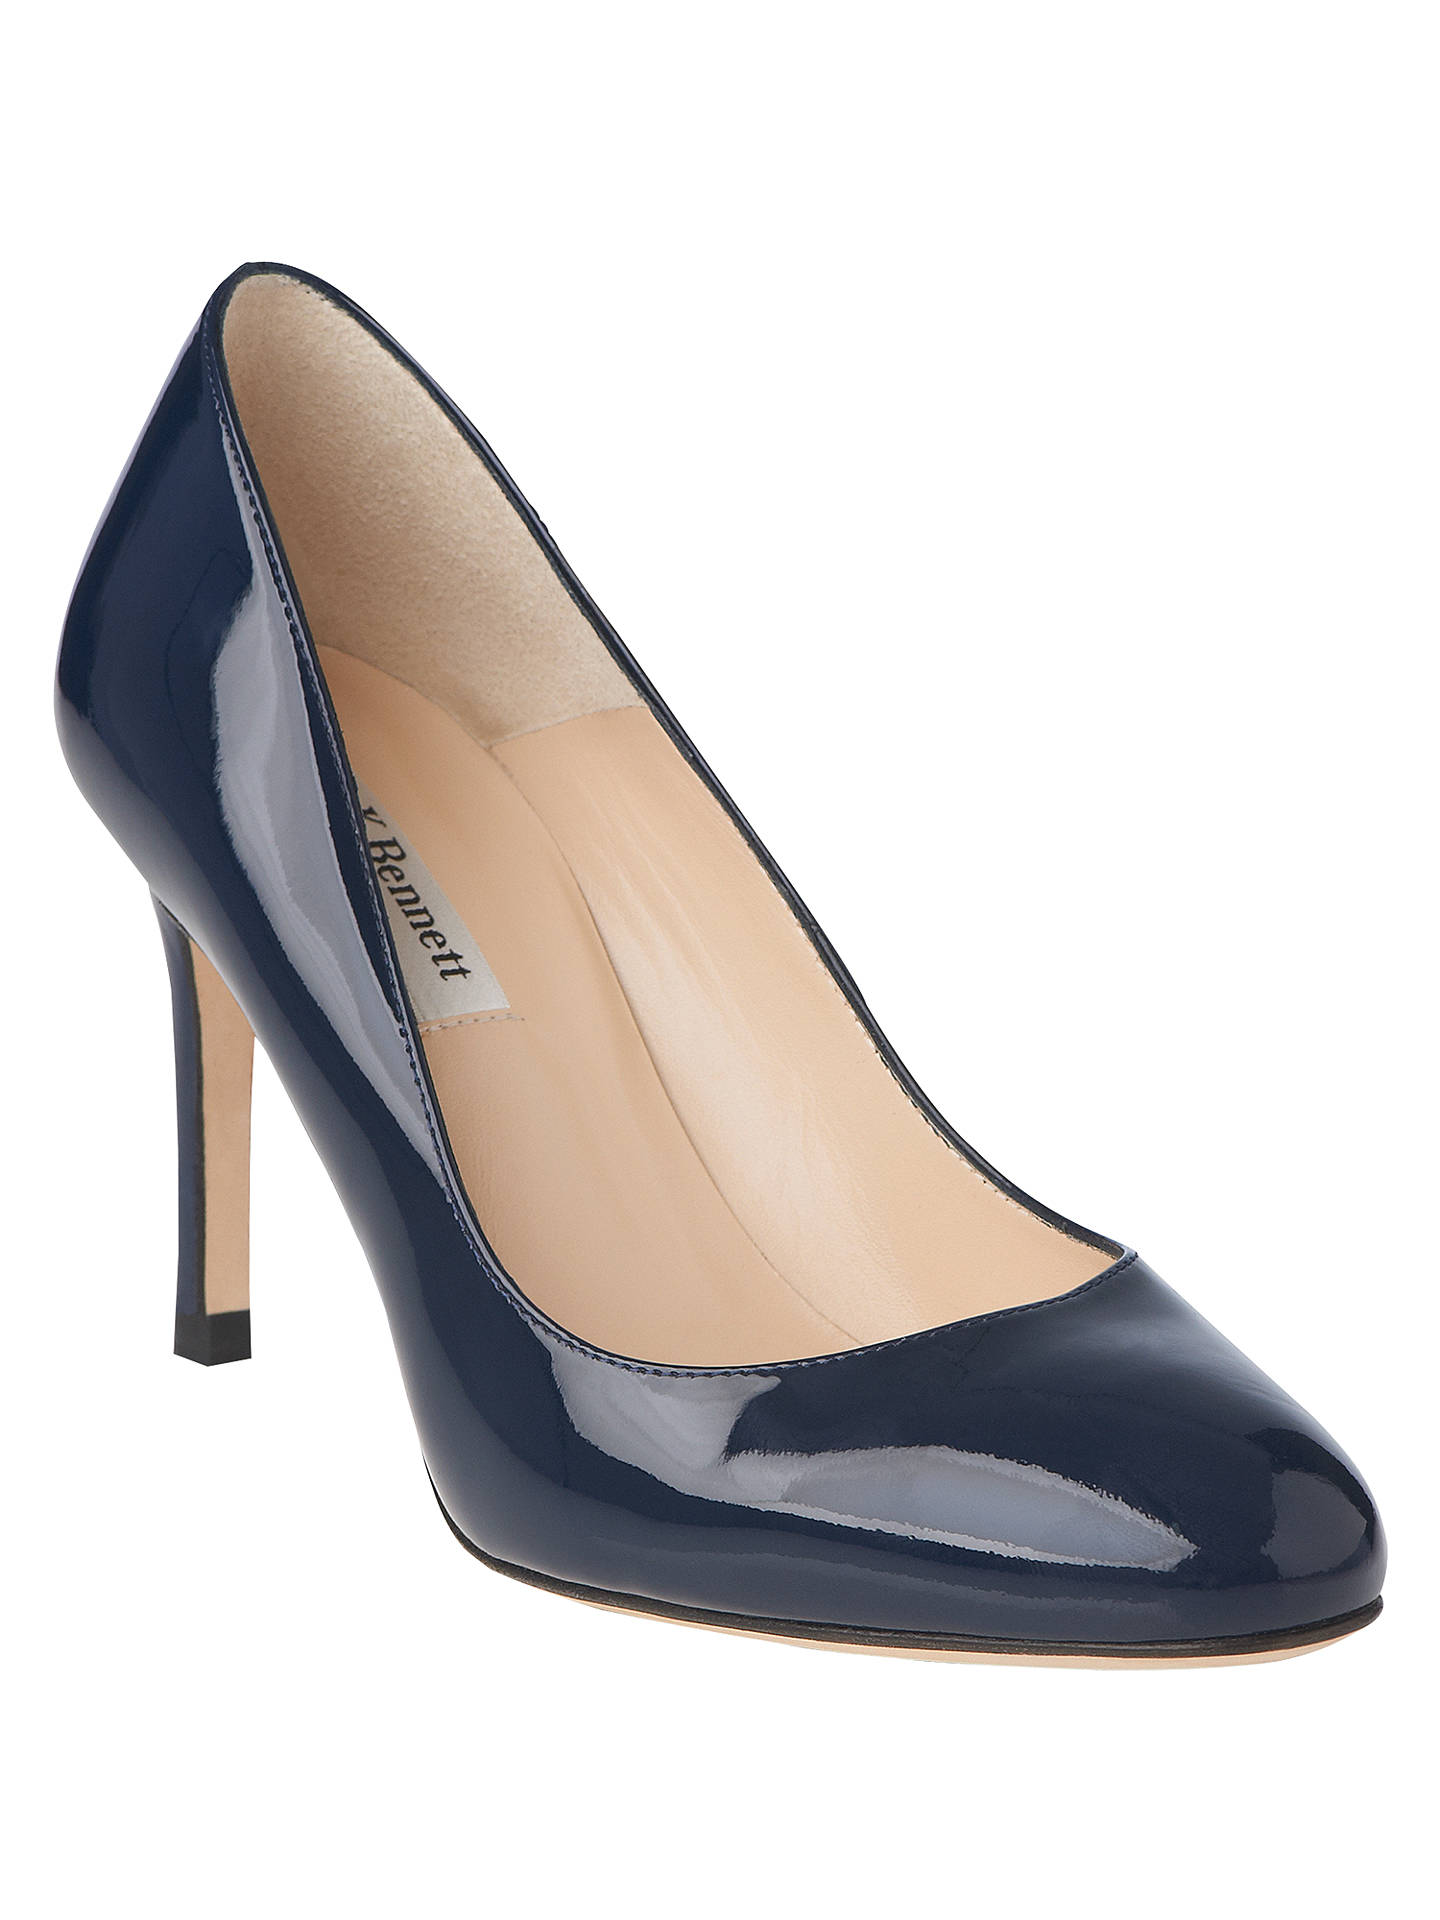 e8a686954c30 L.K. Bennett Sasha Round Toe Court Shoes at John Lewis   Partners